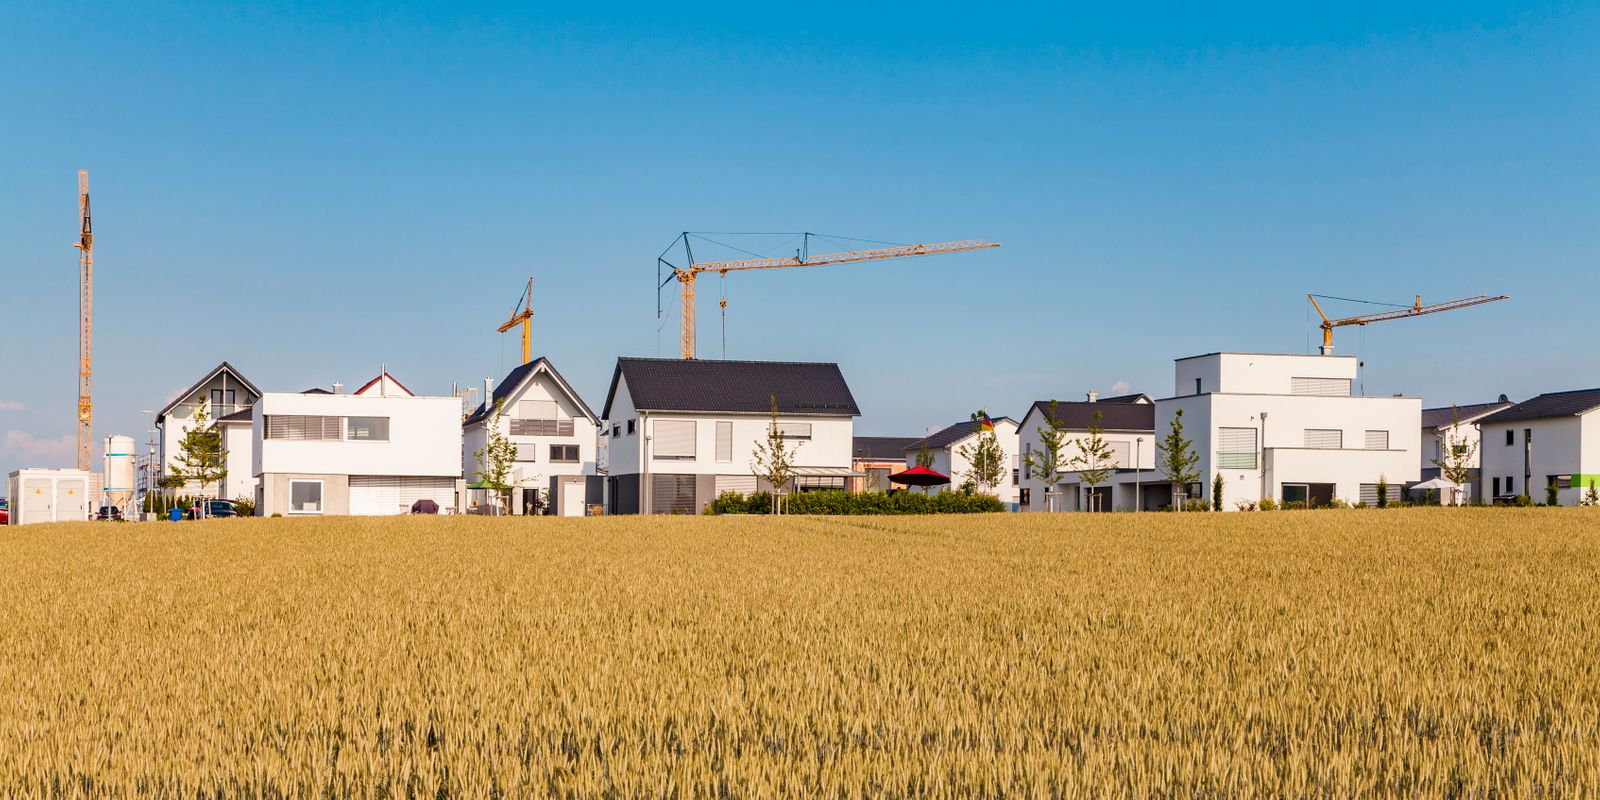 Germany, Baden-Wuerttemberg, Ulm, Lehr, modern one-family houses, cranes